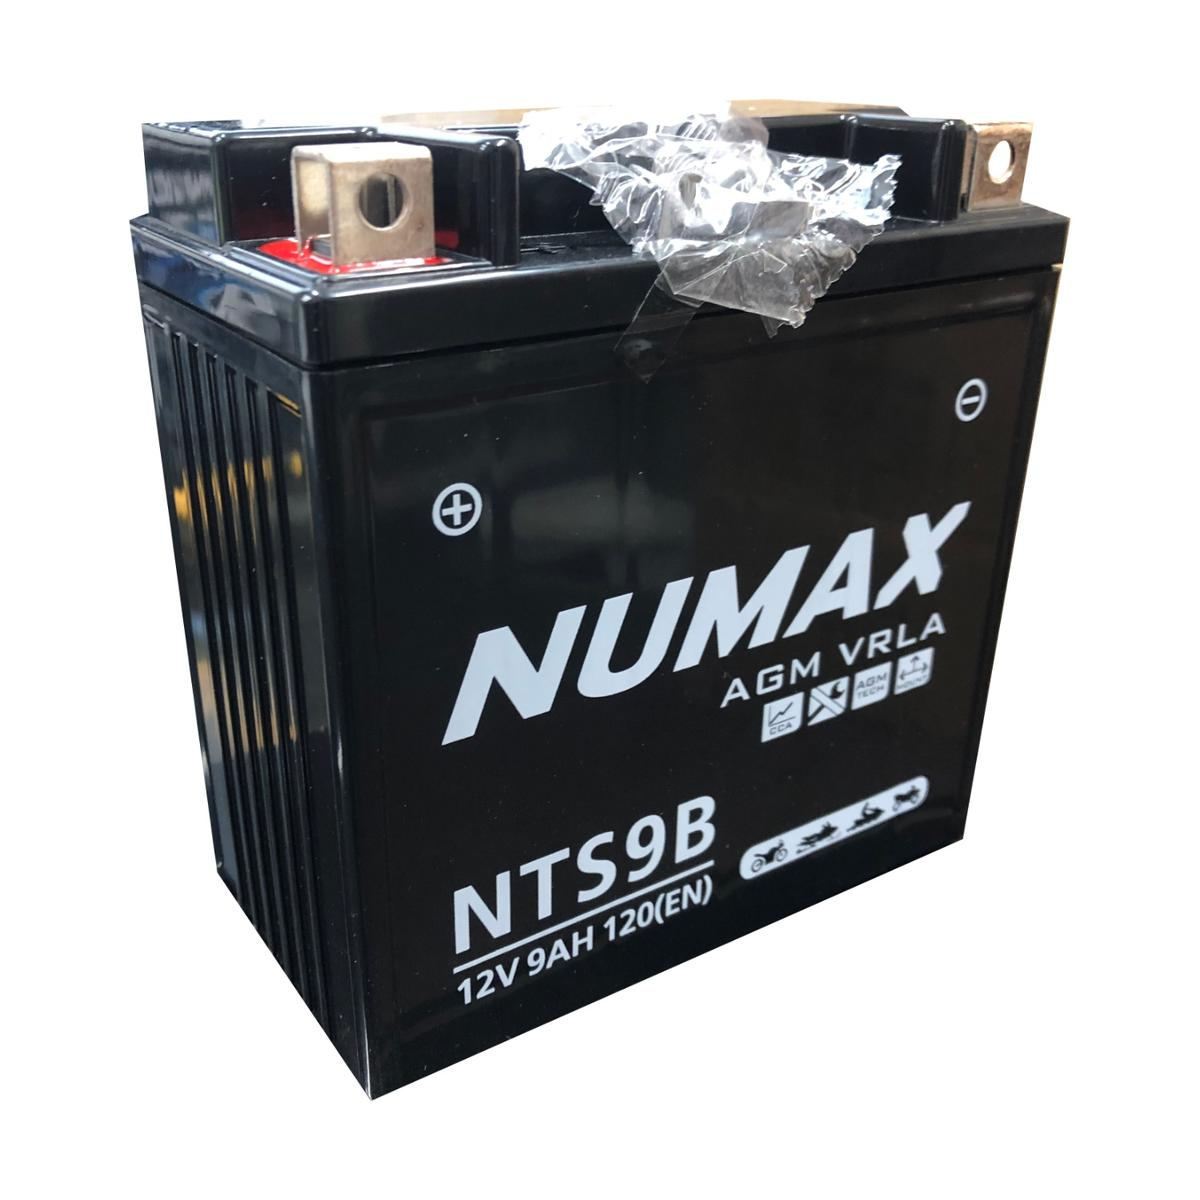 Numax NTS9B 12v Bike Motorbike Motorcycle Battery VESPA 150cc Liberty YB9L-B